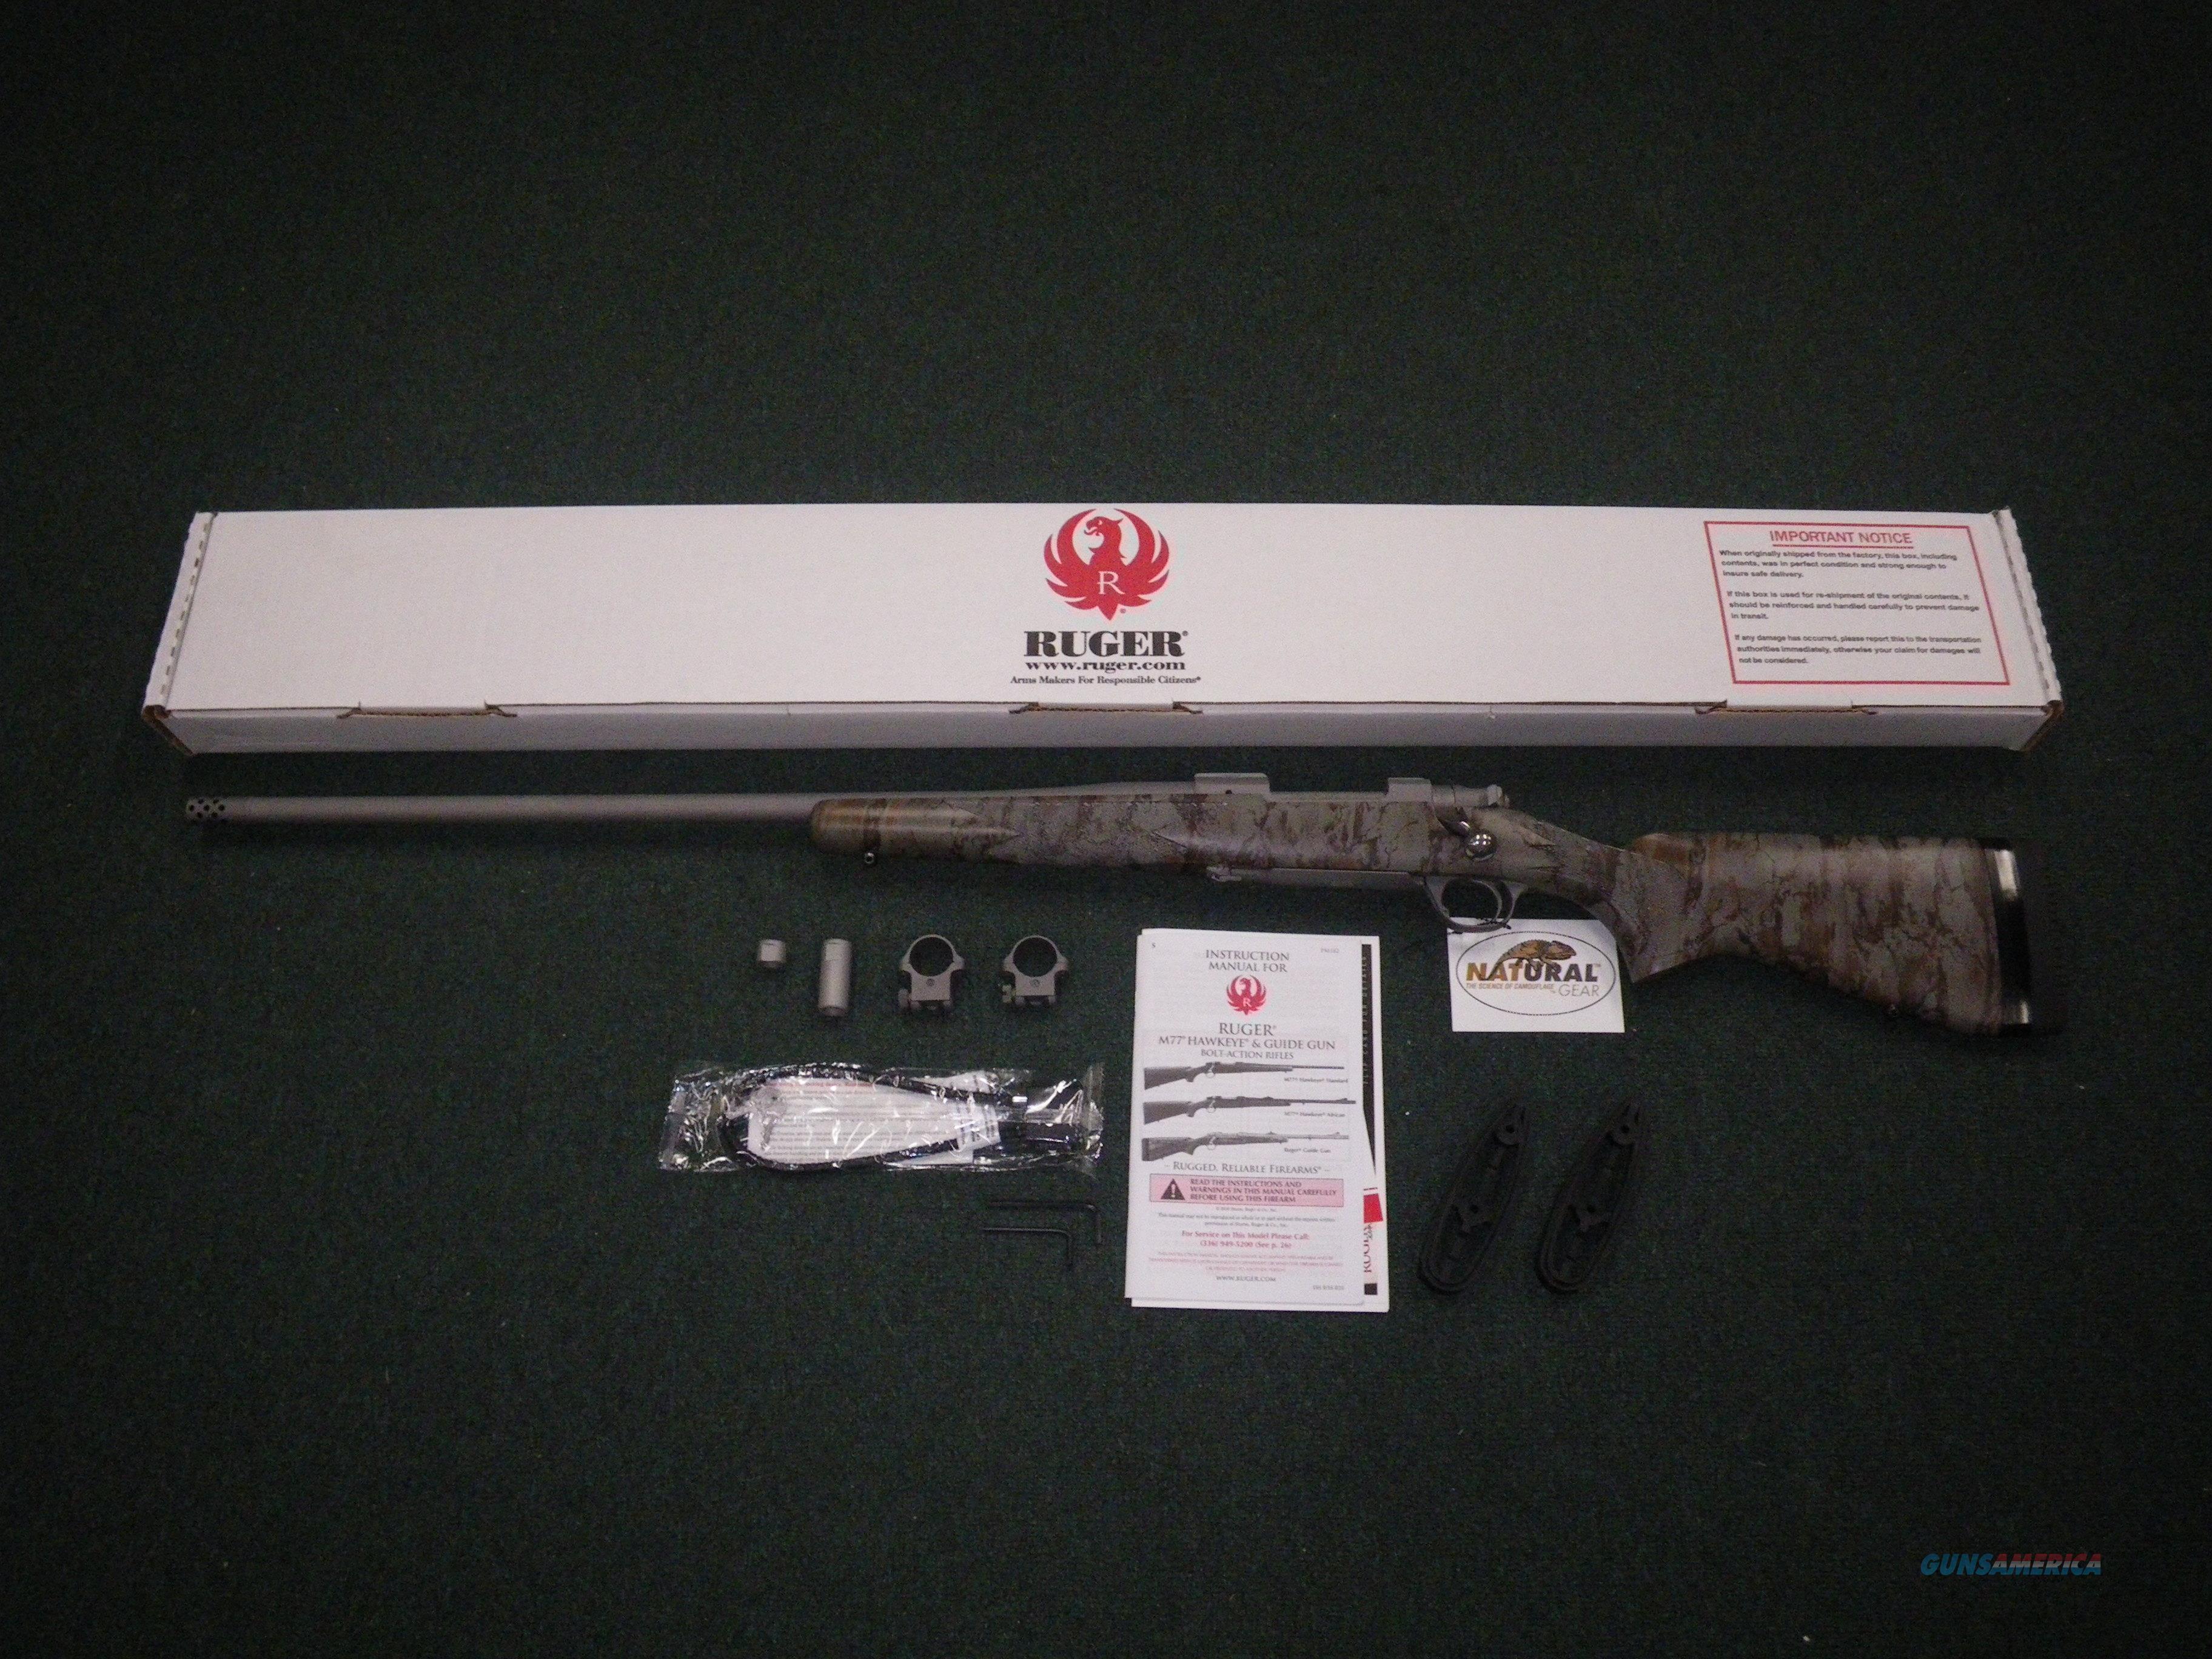 "Ruger Hawkeye FTW Hunter Rifle LH 6.5 Creed 24"" NEW #47174  Guns > Rifles > Ruger Rifles > Model 77"